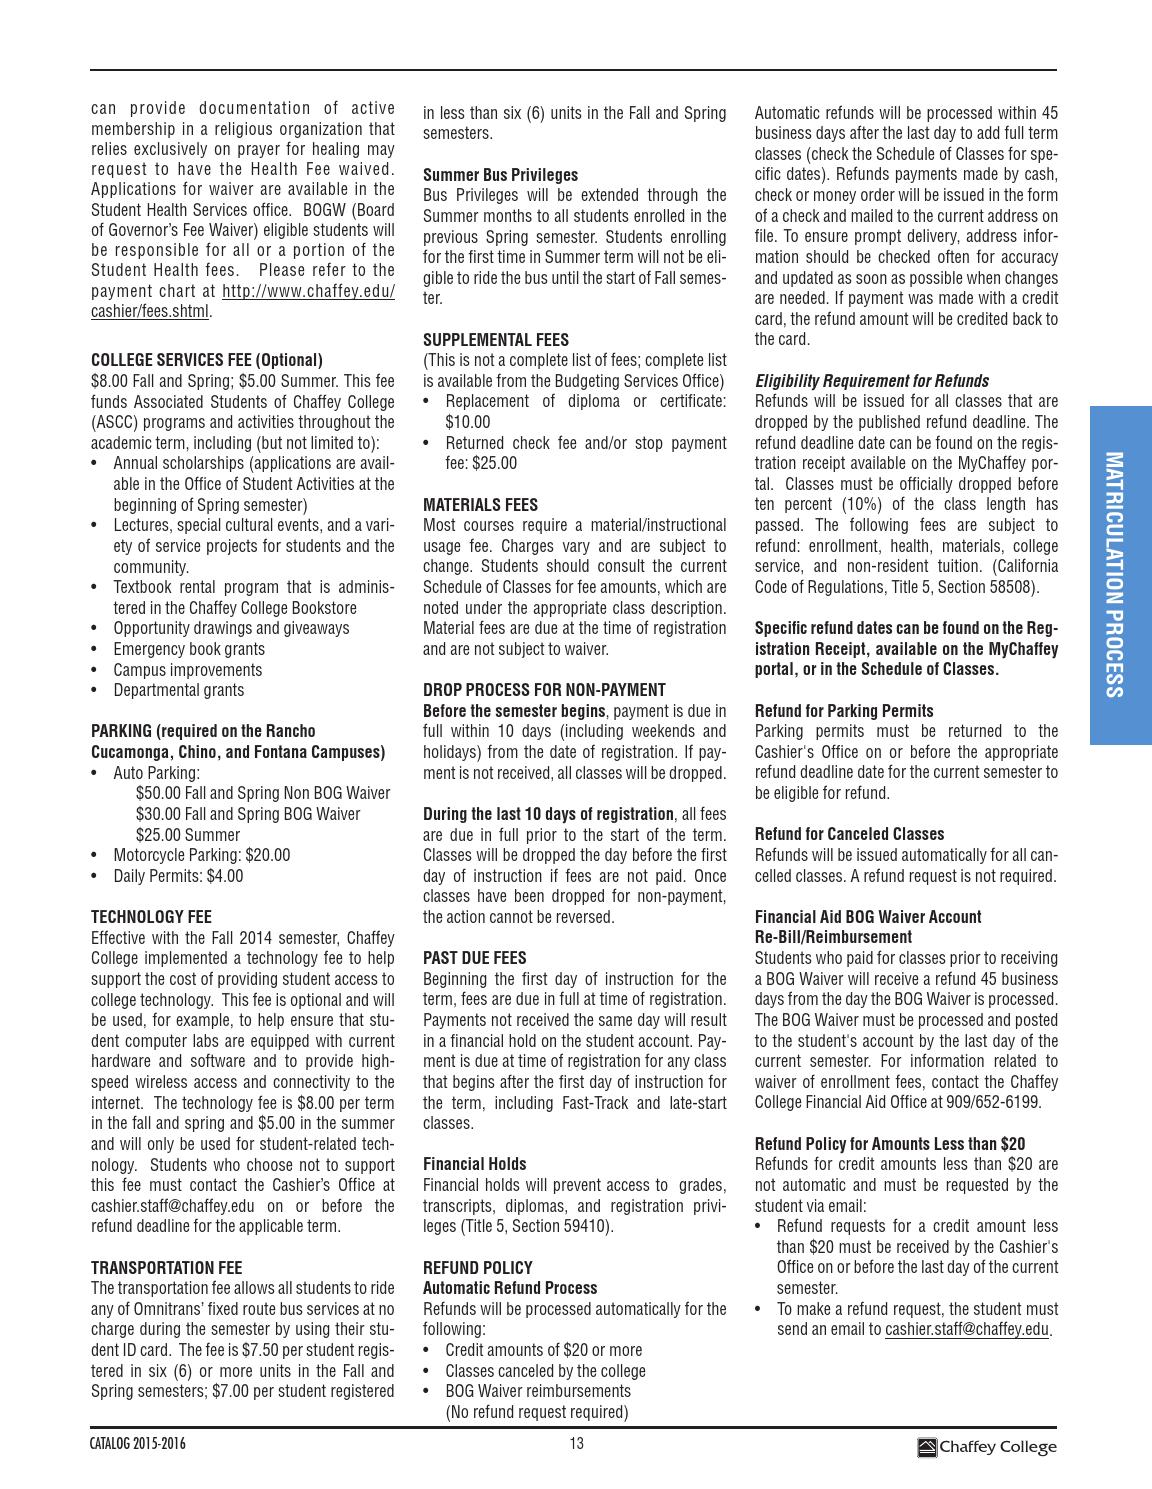 Chaffey College Catalog 2015 2016 by Chaffey College - issuu